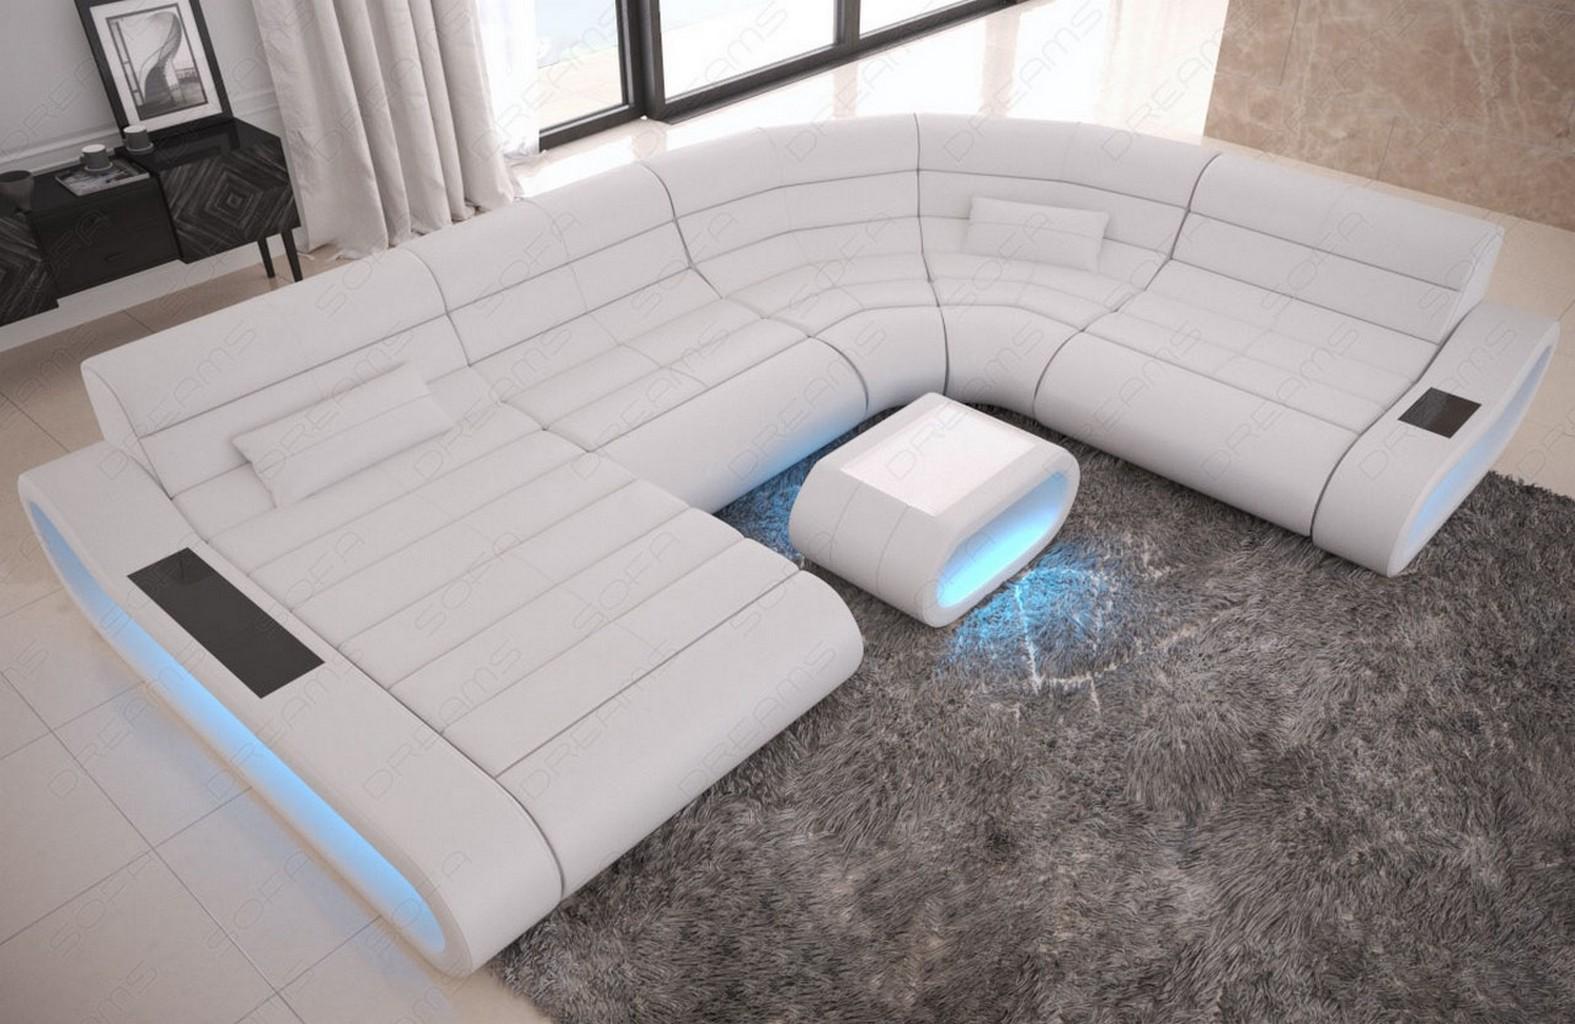 sofa couch xxl echtleder garnitur concept ottomane beleuchtung gro e sitzfl chen ebay. Black Bedroom Furniture Sets. Home Design Ideas